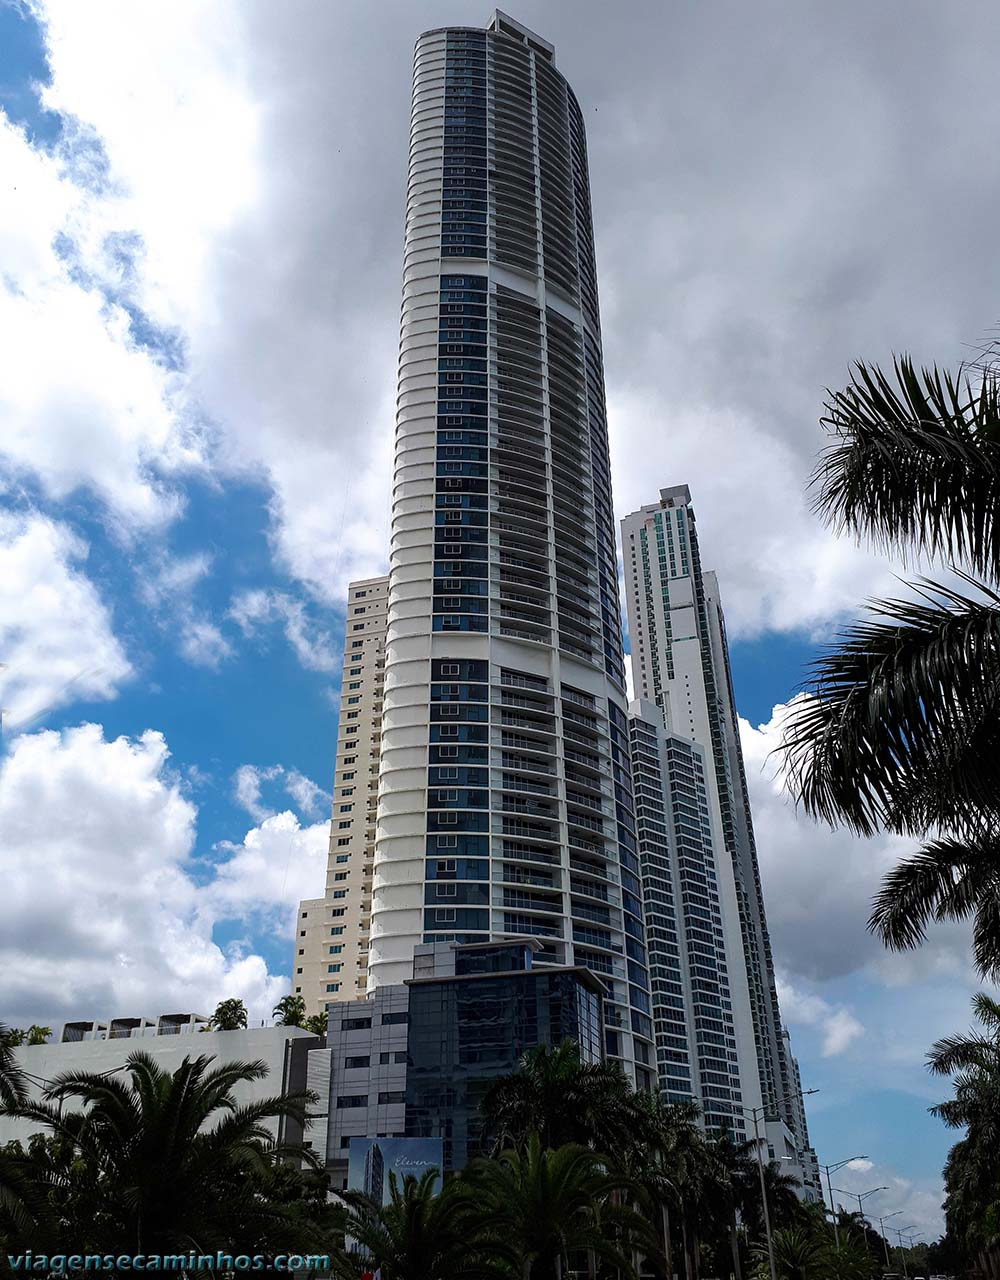 Edifício Pearl of the Sea - Panamá